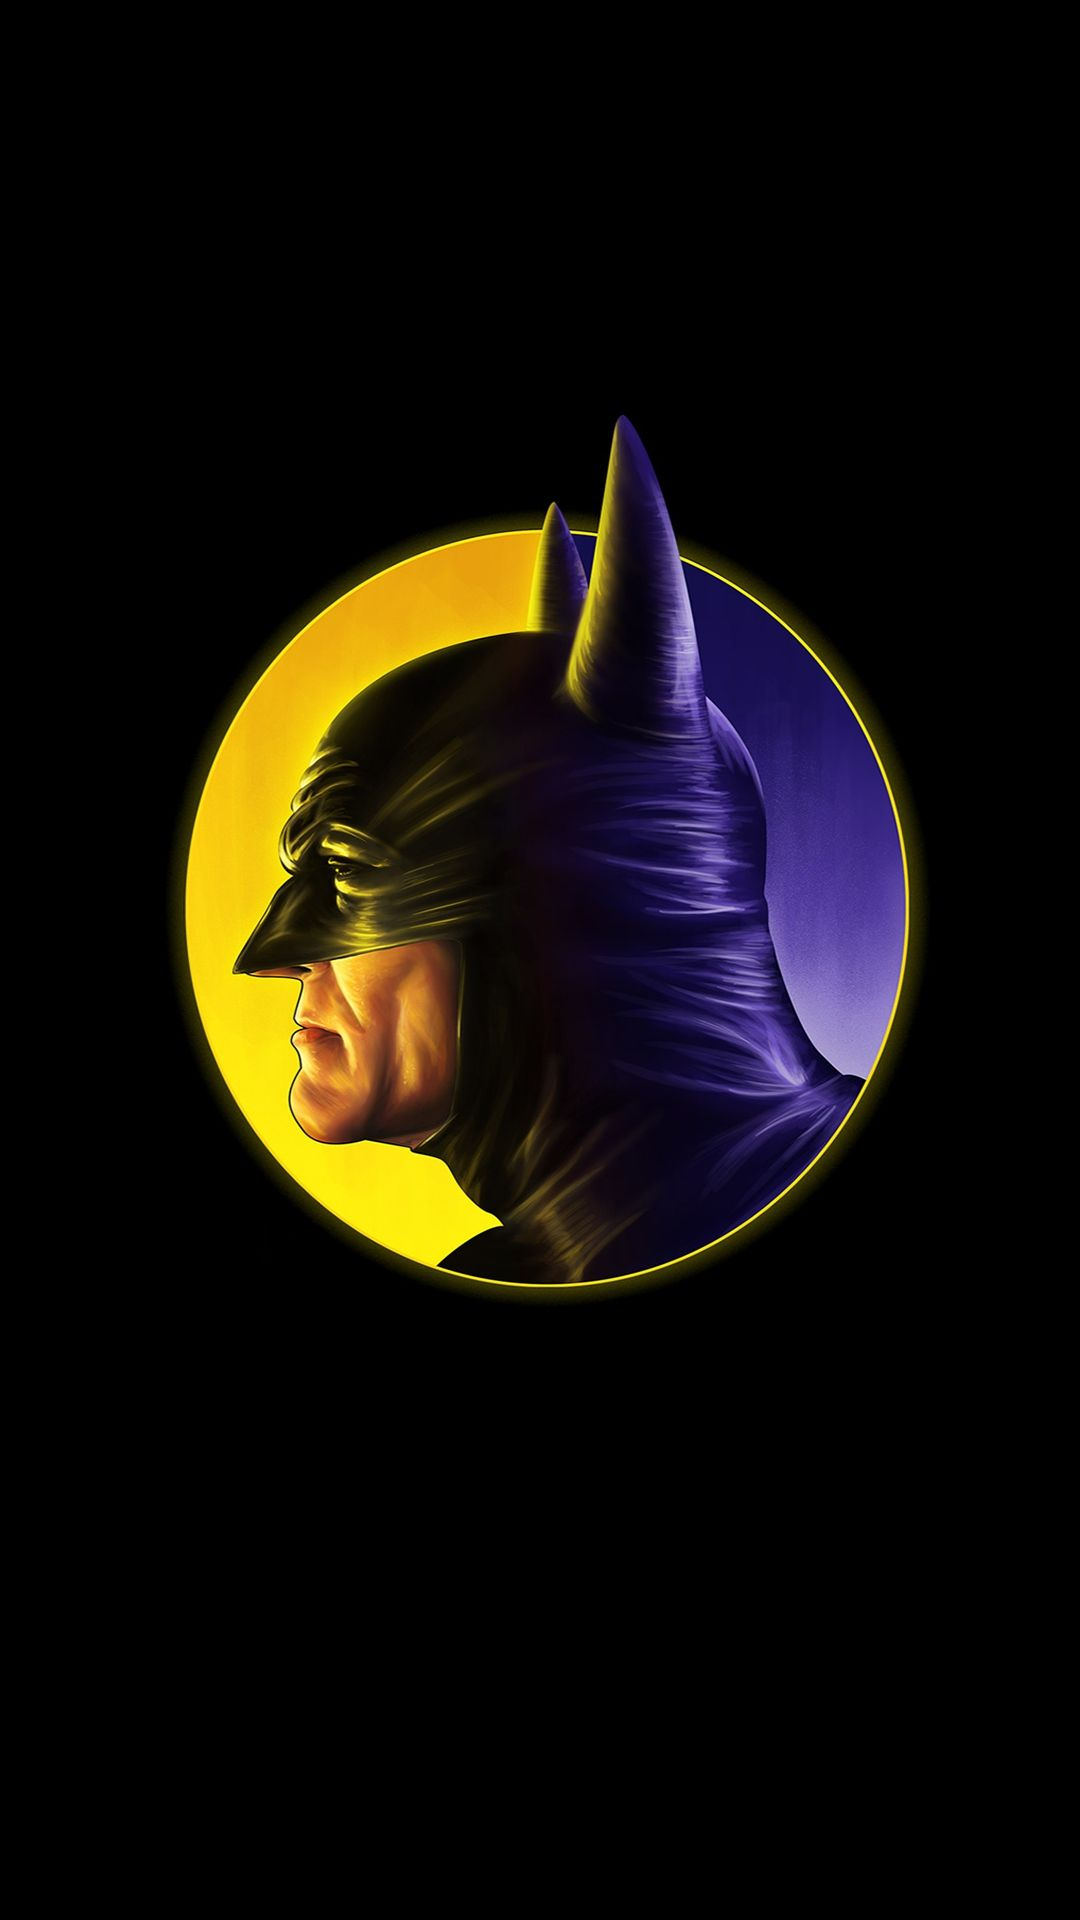 The Batman Dark Minimal Iphone Wallpaper Minimal Wallpaper